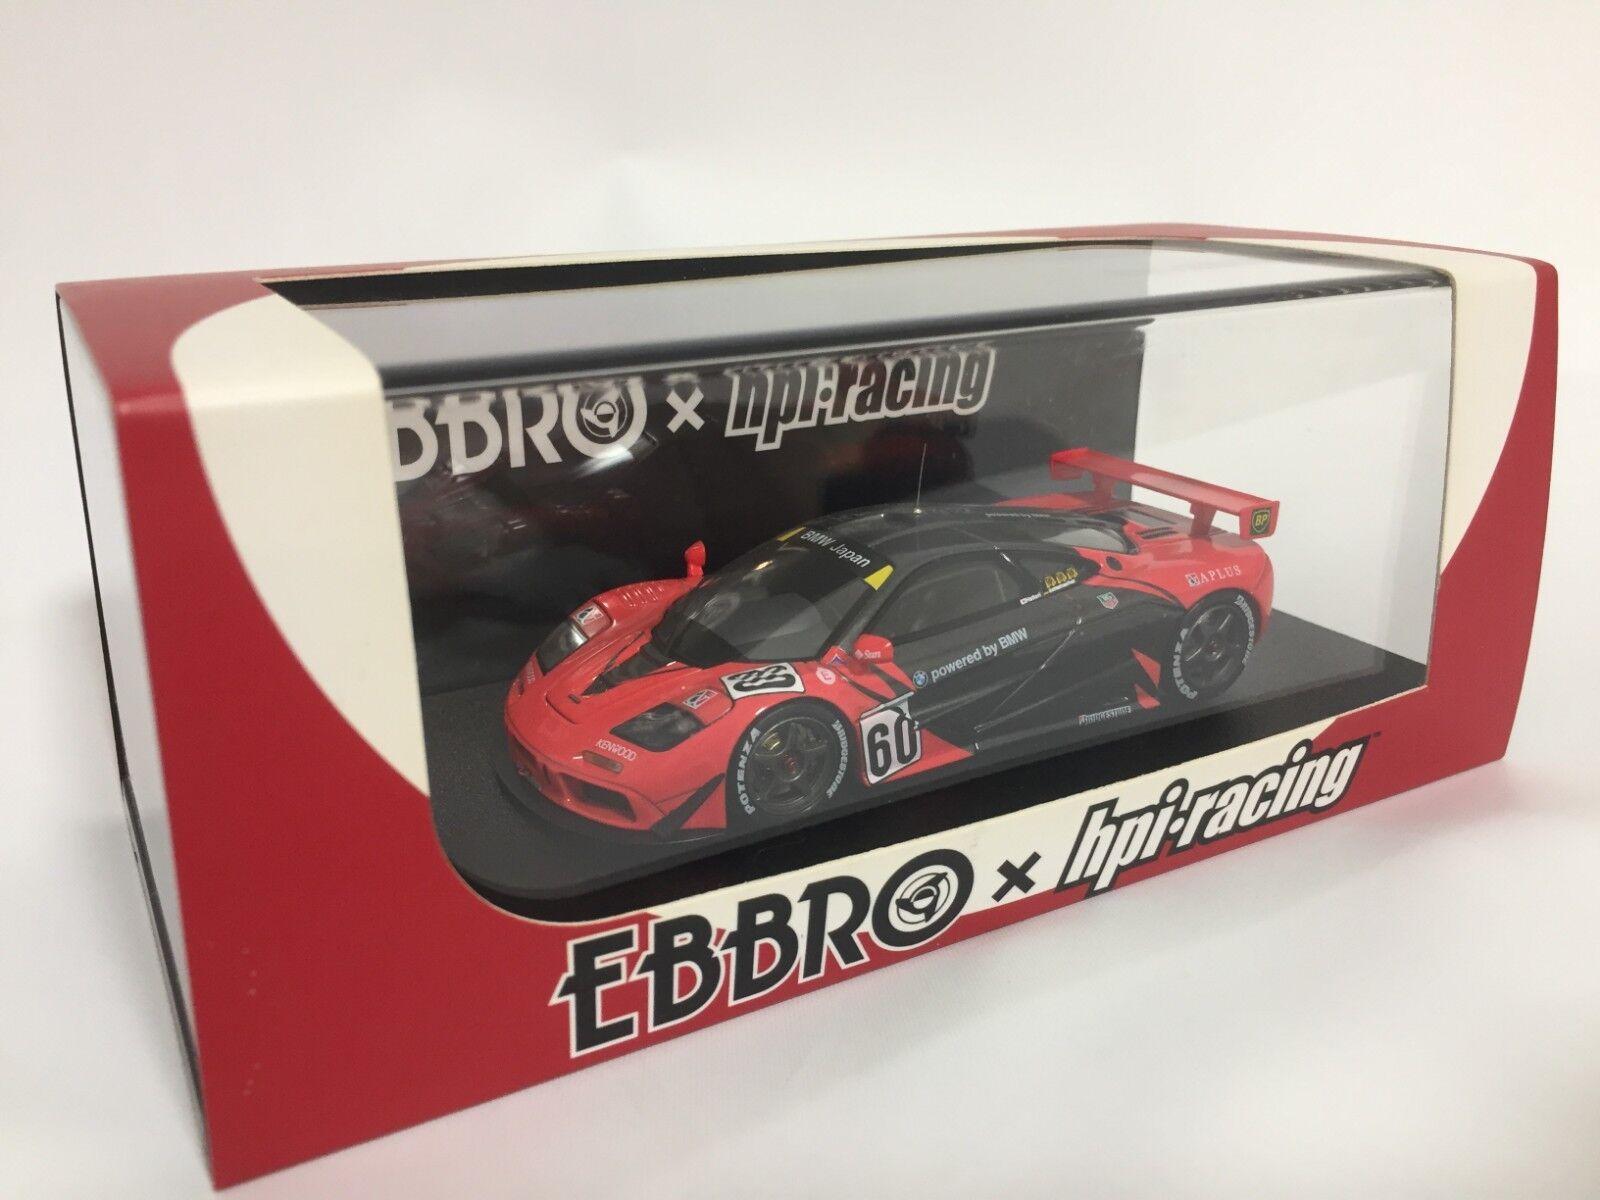 EBBRO 8537 EBBRO x HPI (Go for  it Japan ) McLaren F1 GTR 1996 JGTC  60 1 43 Scale  livraison gratuite